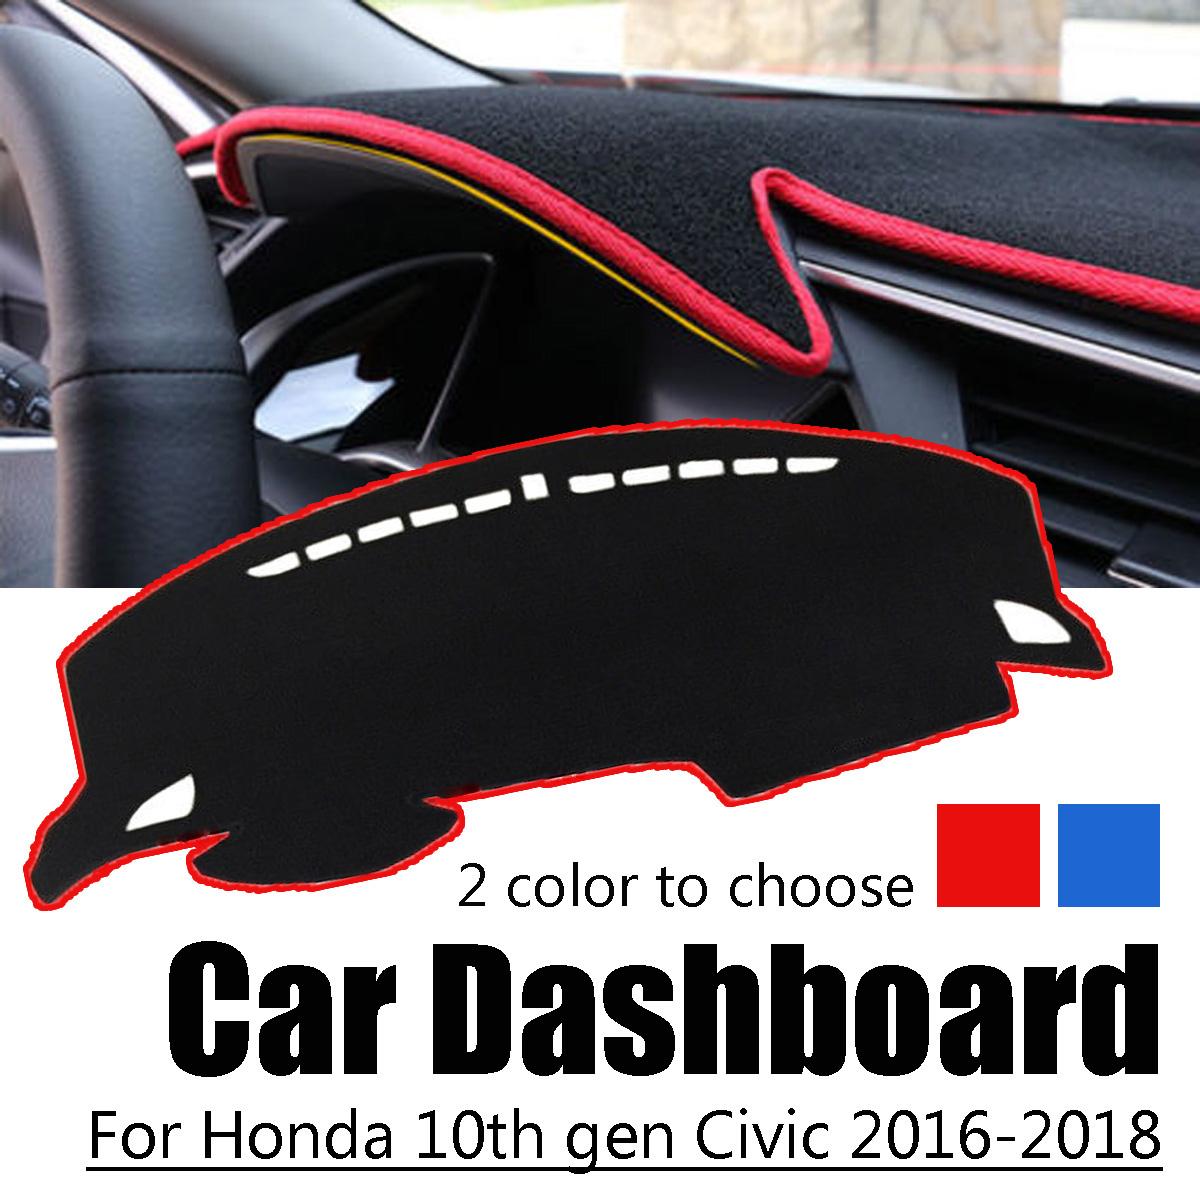 Non-slip Car Dash Mat Dashboard Sun Cover Pad Polyester DashMat for Honda 10th Gen Civic 2016-2018